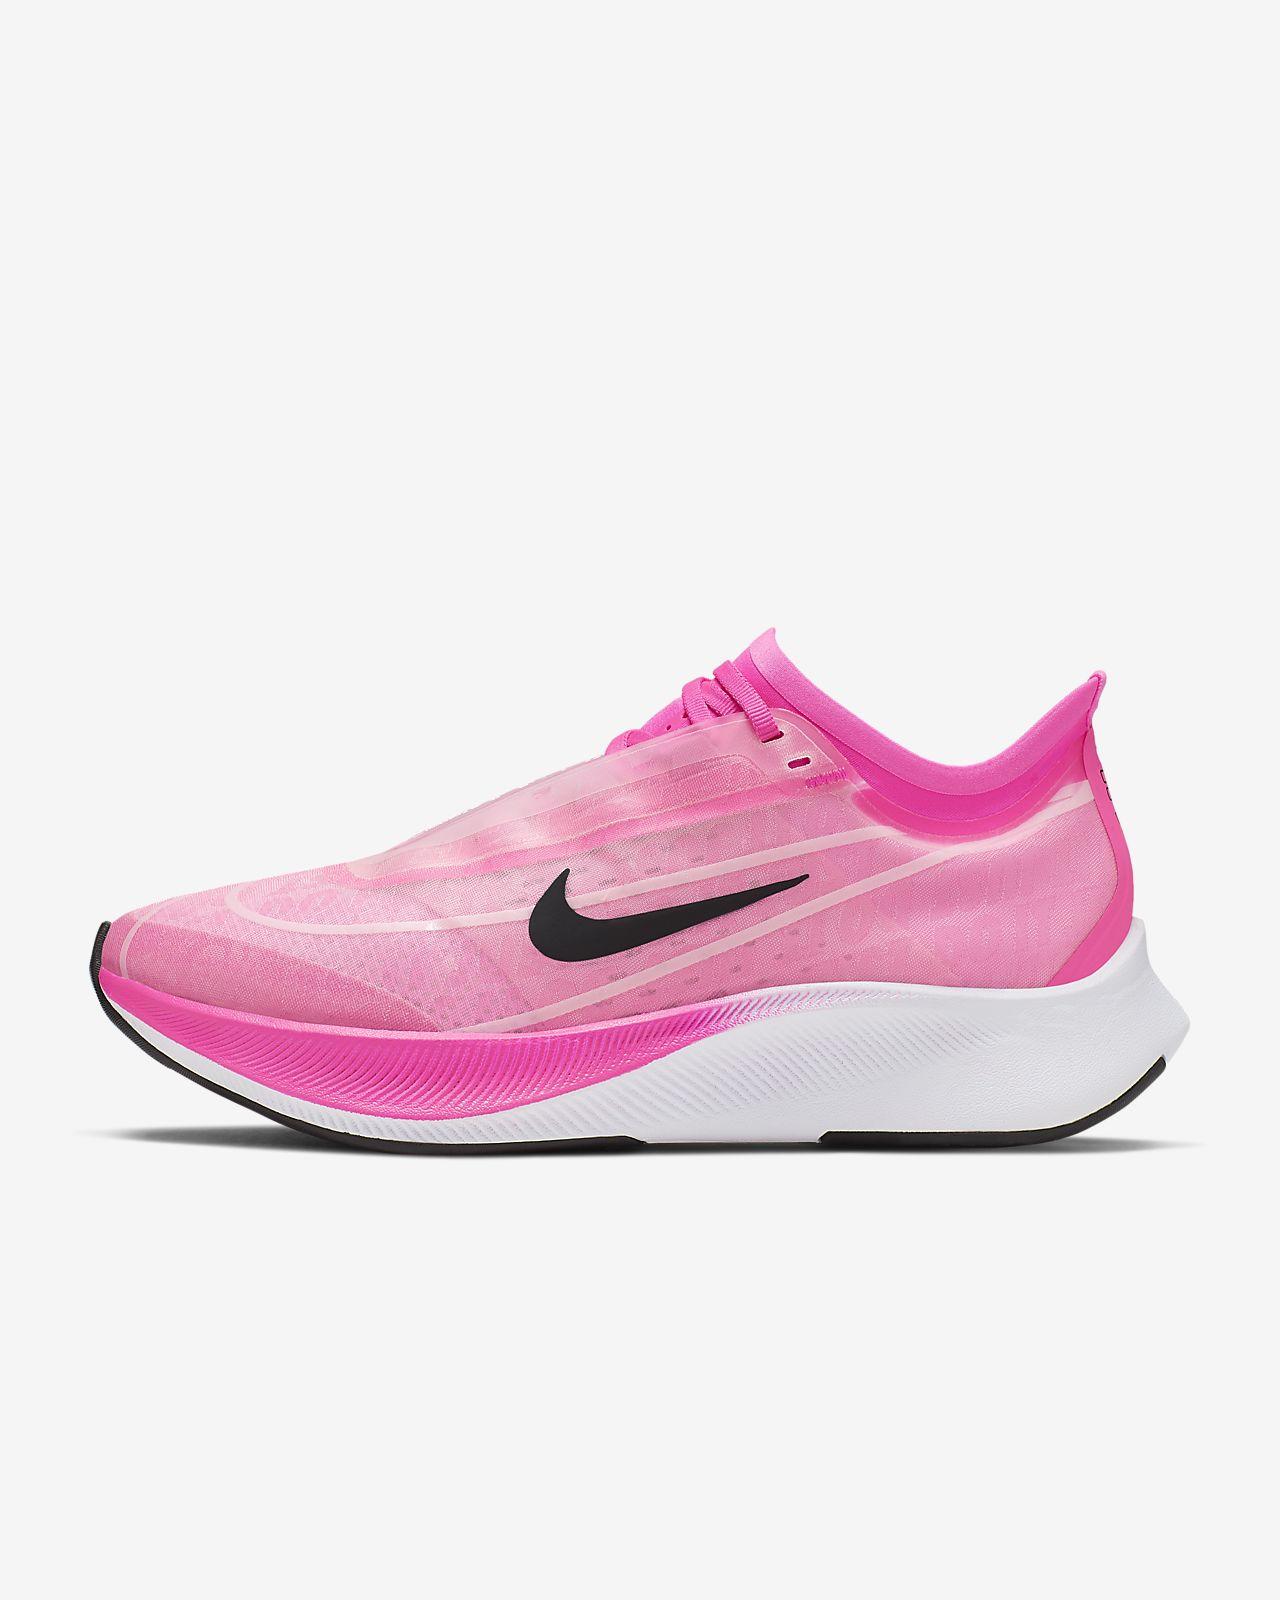 Nike Zoom Fly 3 Zapatillas de running - Mujer